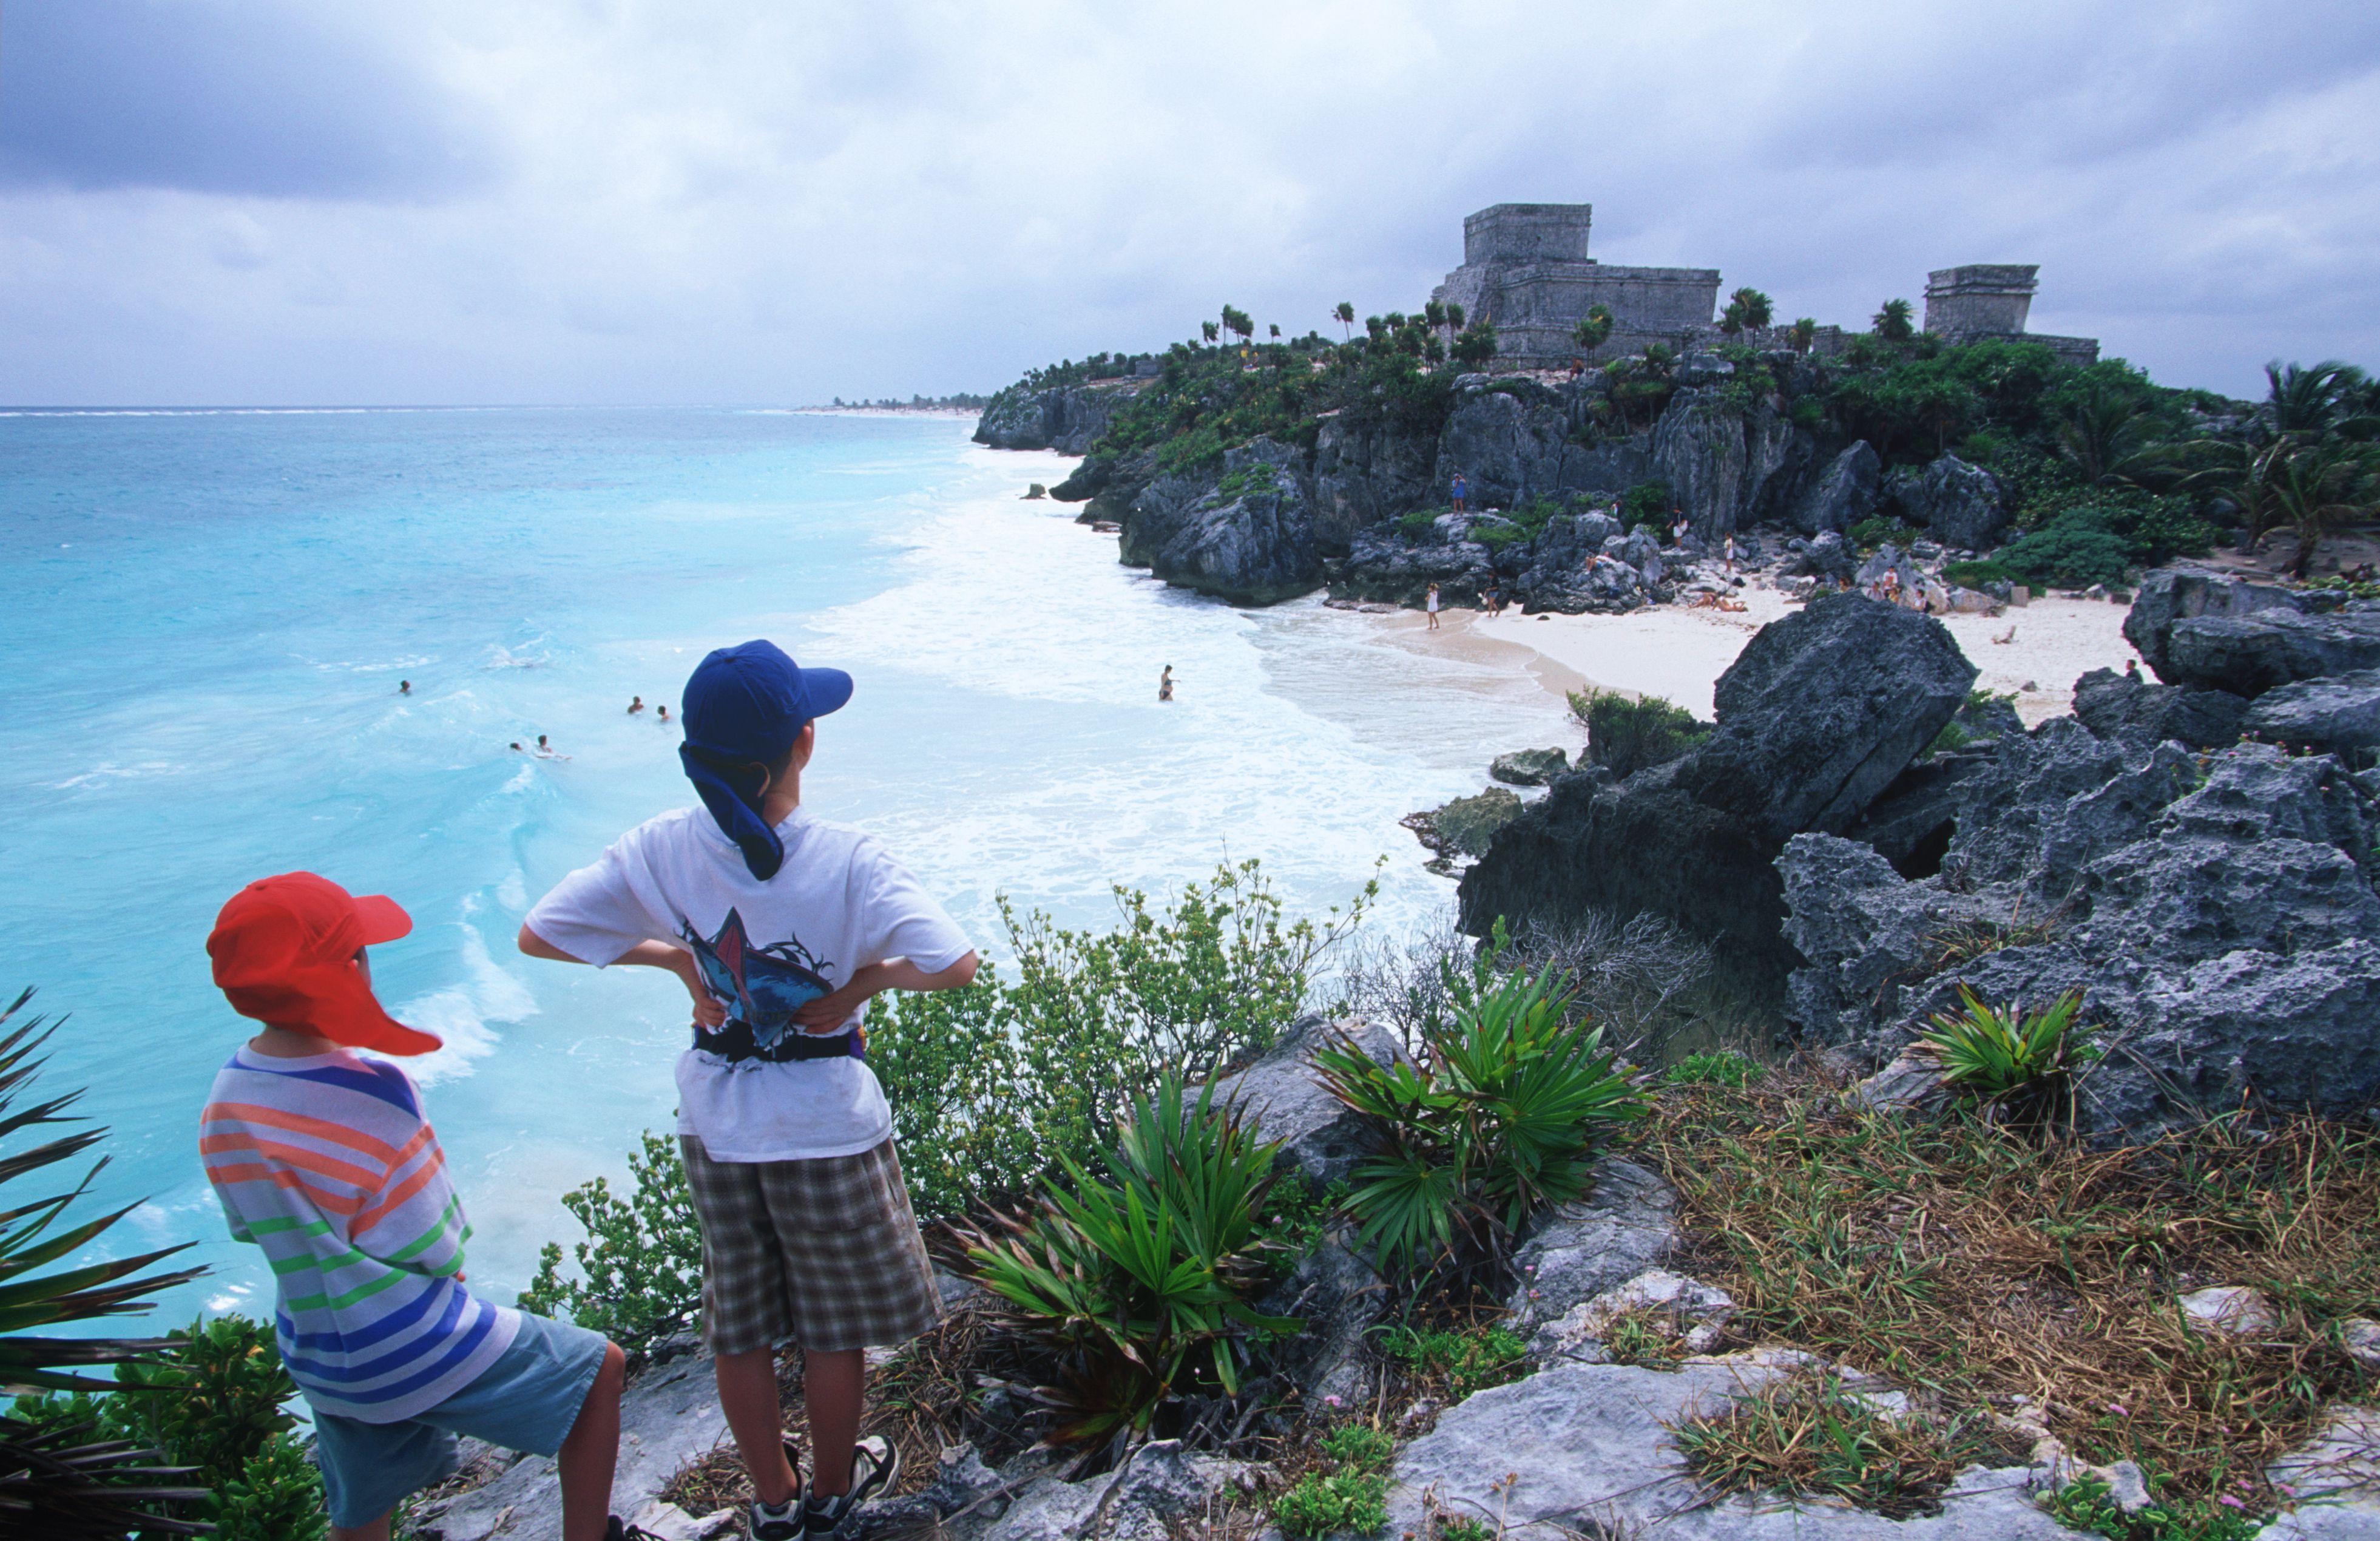 Mexico, Yucatan Peninsula, boys on vista overlook Tulum, Mayan ruin by the Carribean sea